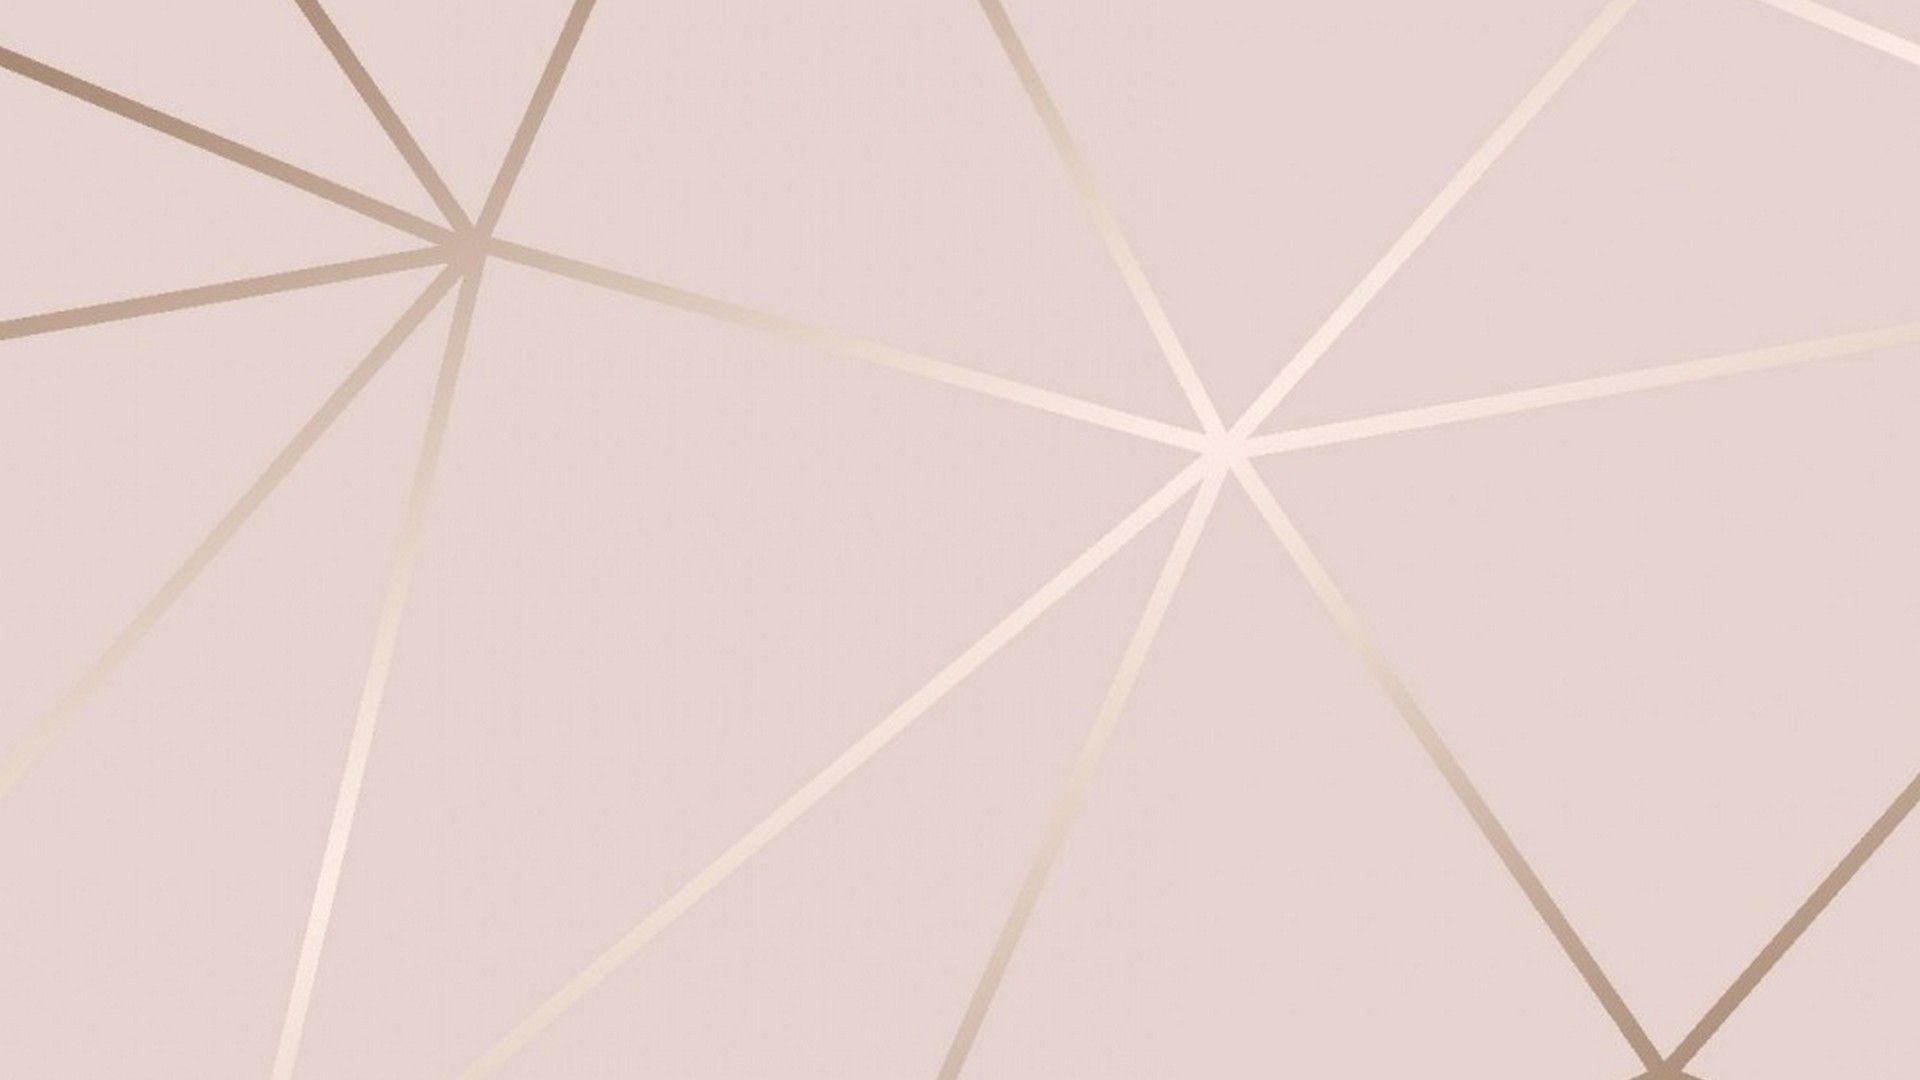 Aesthetic Marble Desktop Wallpapers On Wallpaperdog